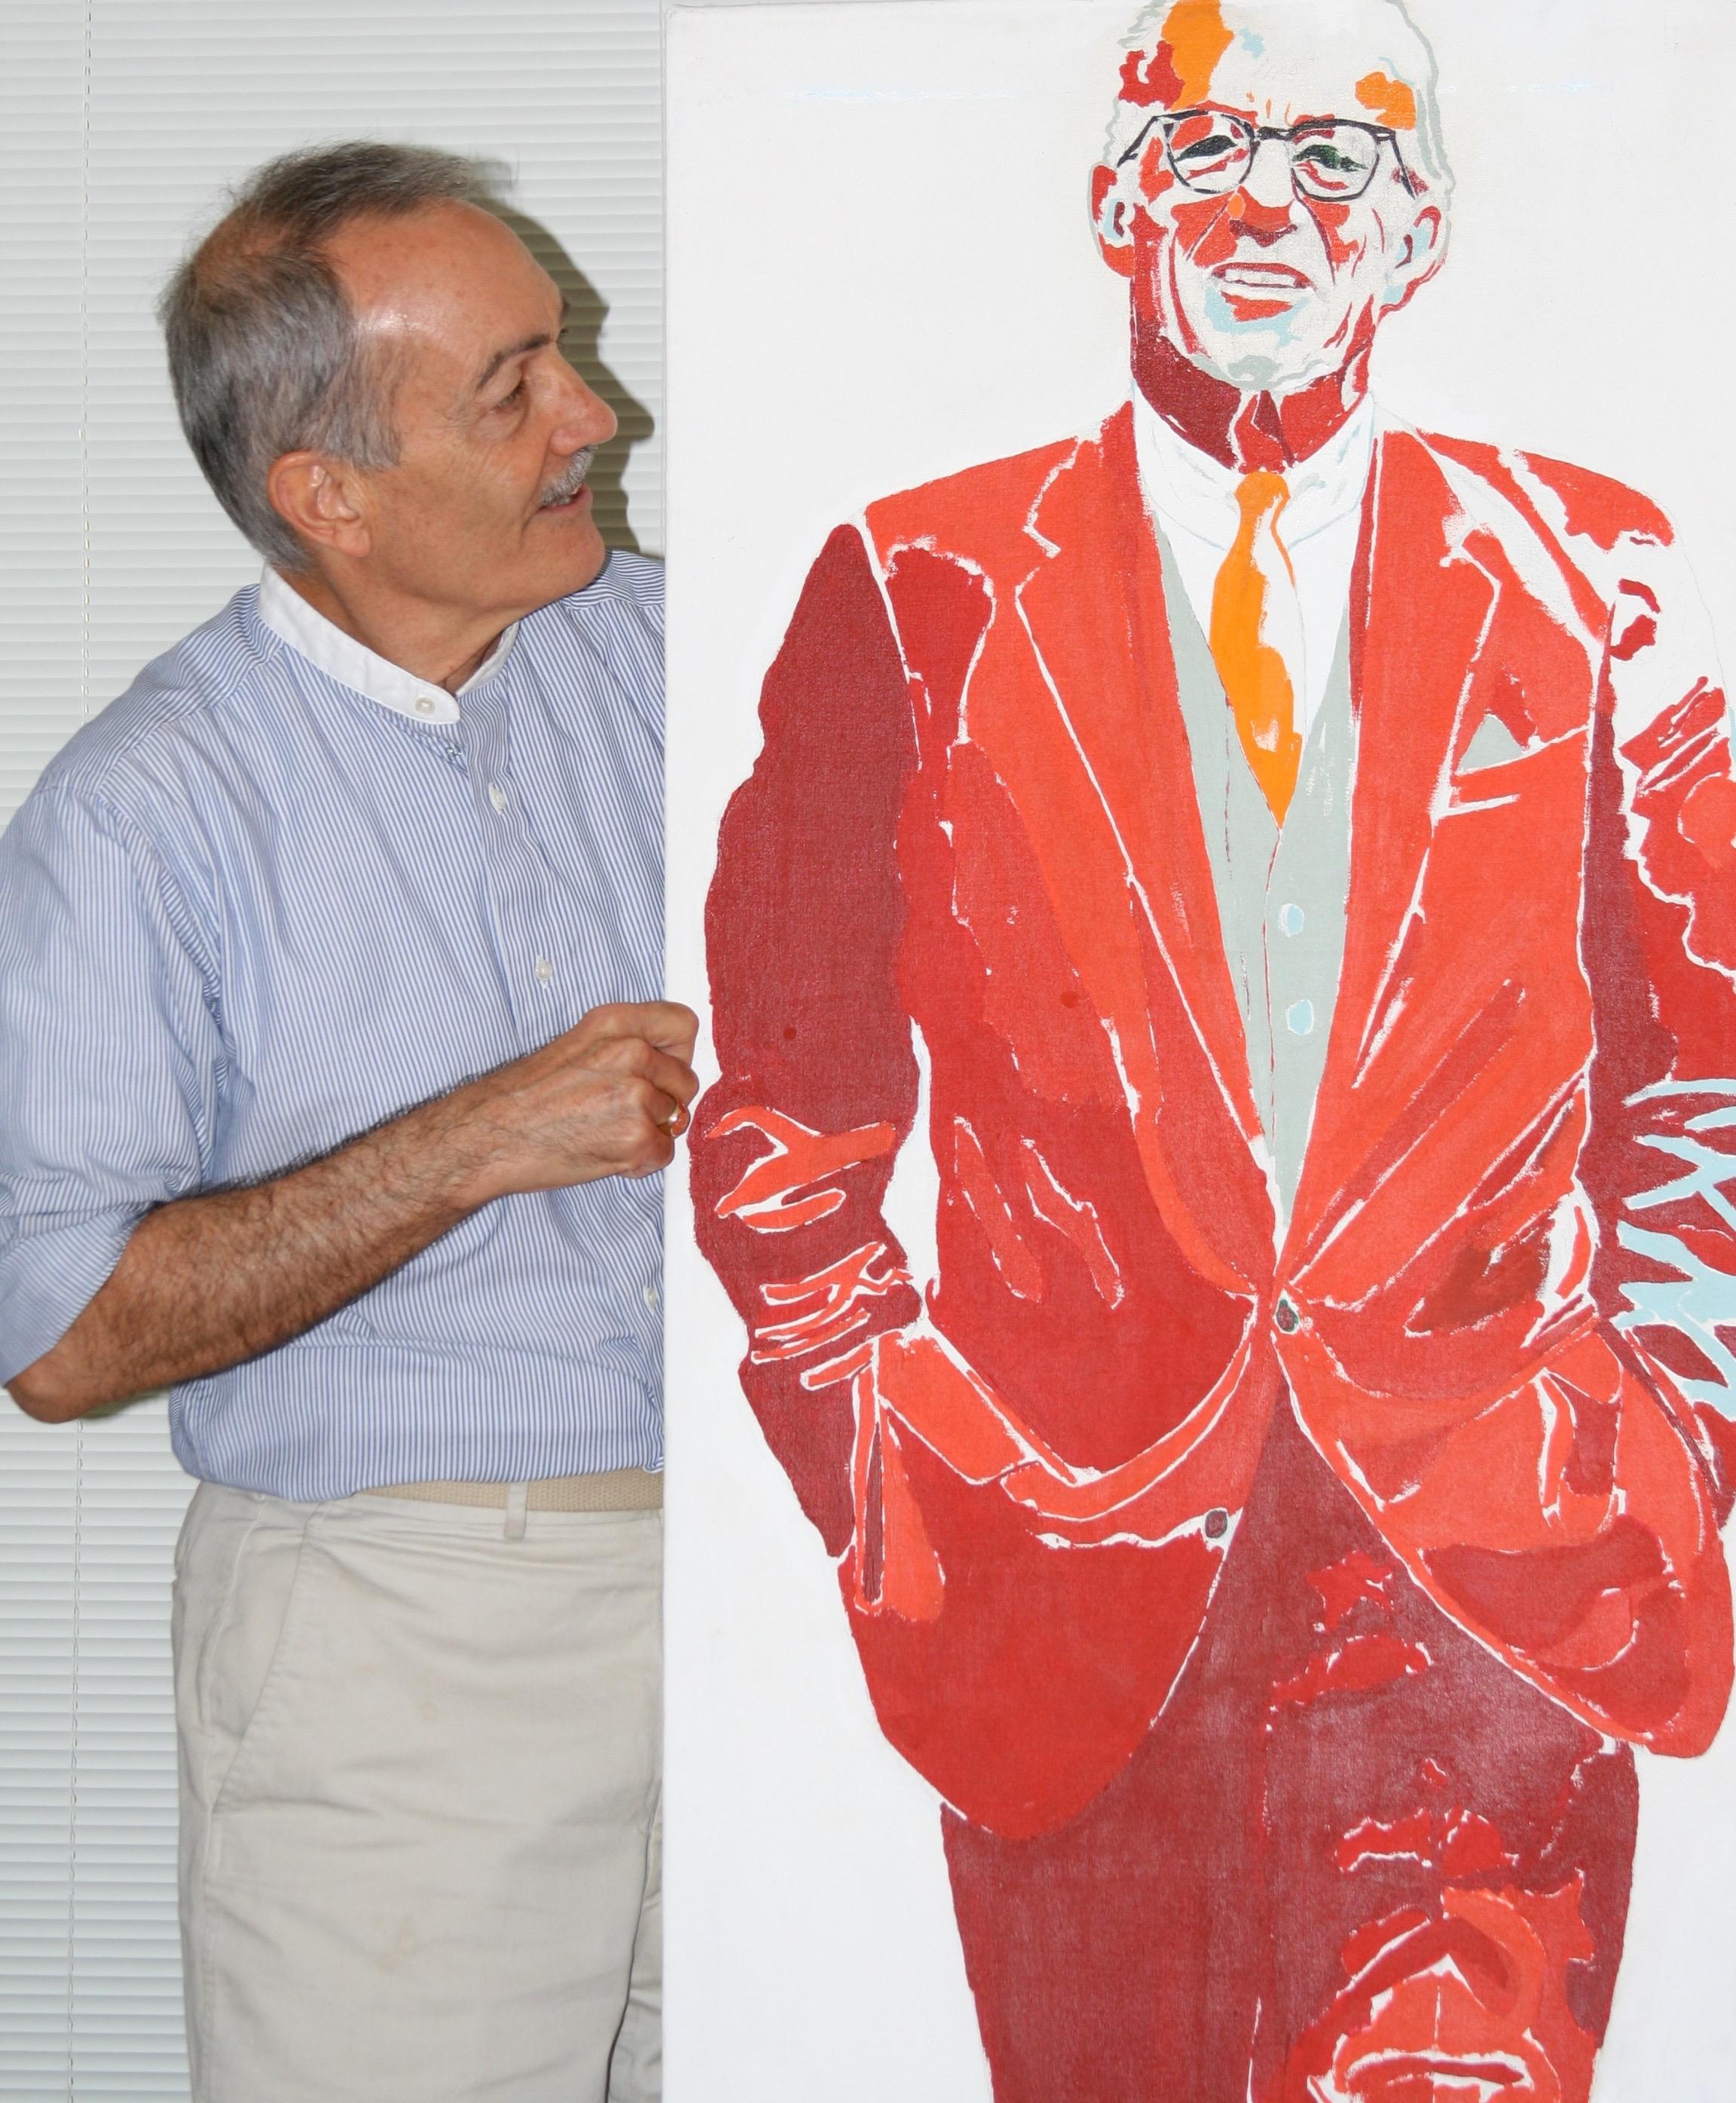 Karl Schonborn Painting Of Activist Amp Baby Doctor Karl